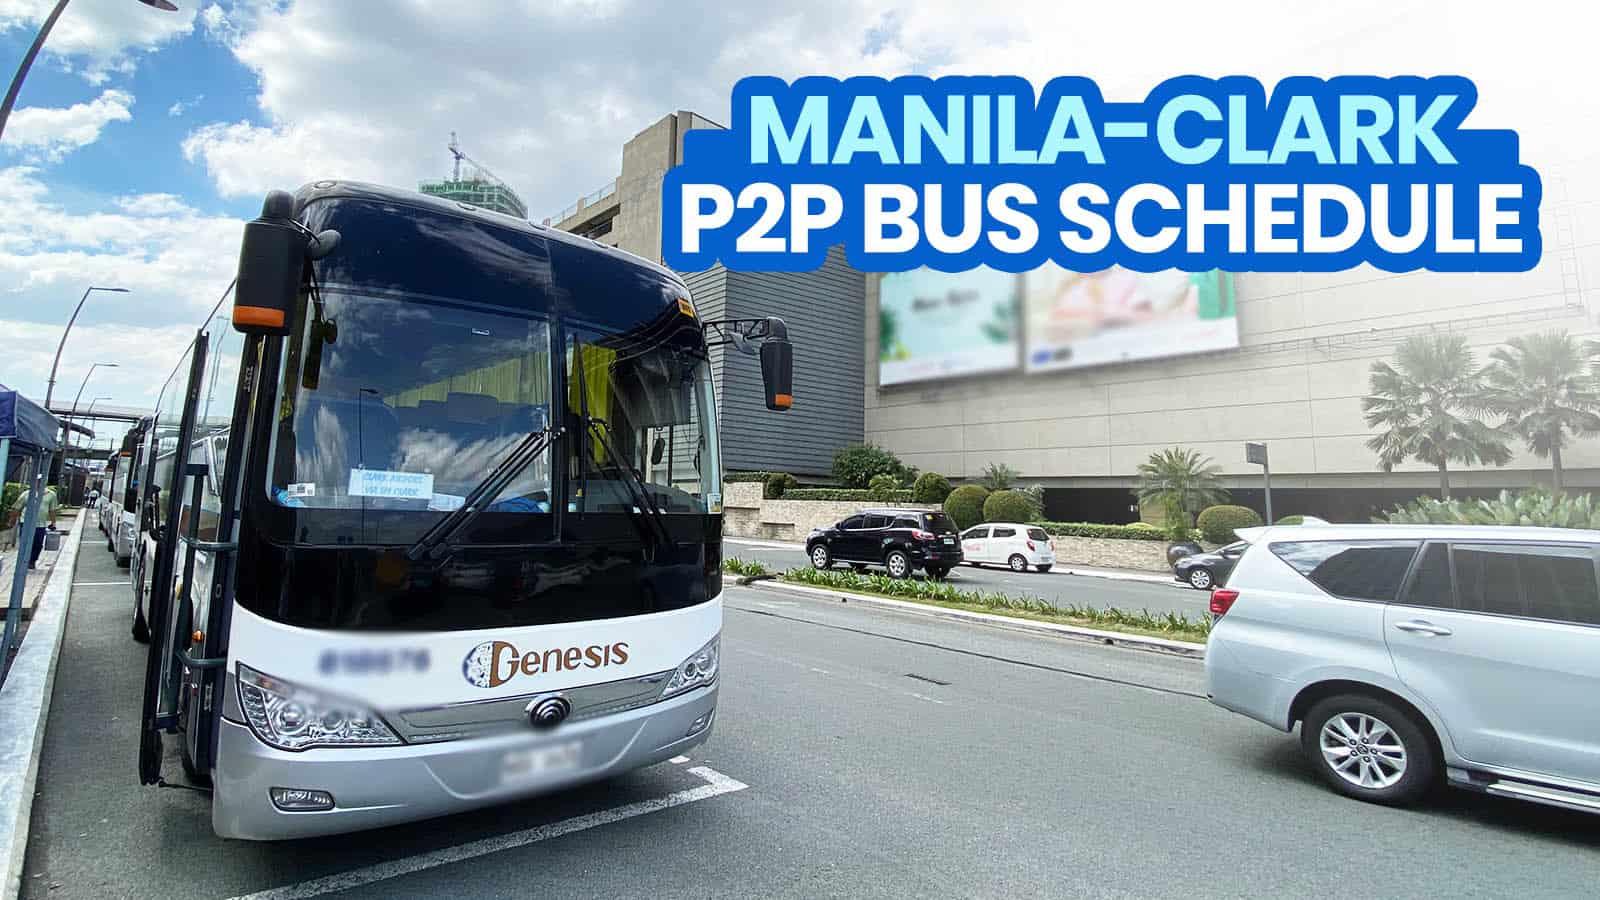 2021 MANILA to CLARK to MANILA P2P BUS SCHEDULE (NAIA, Trinoma, SM Clark)